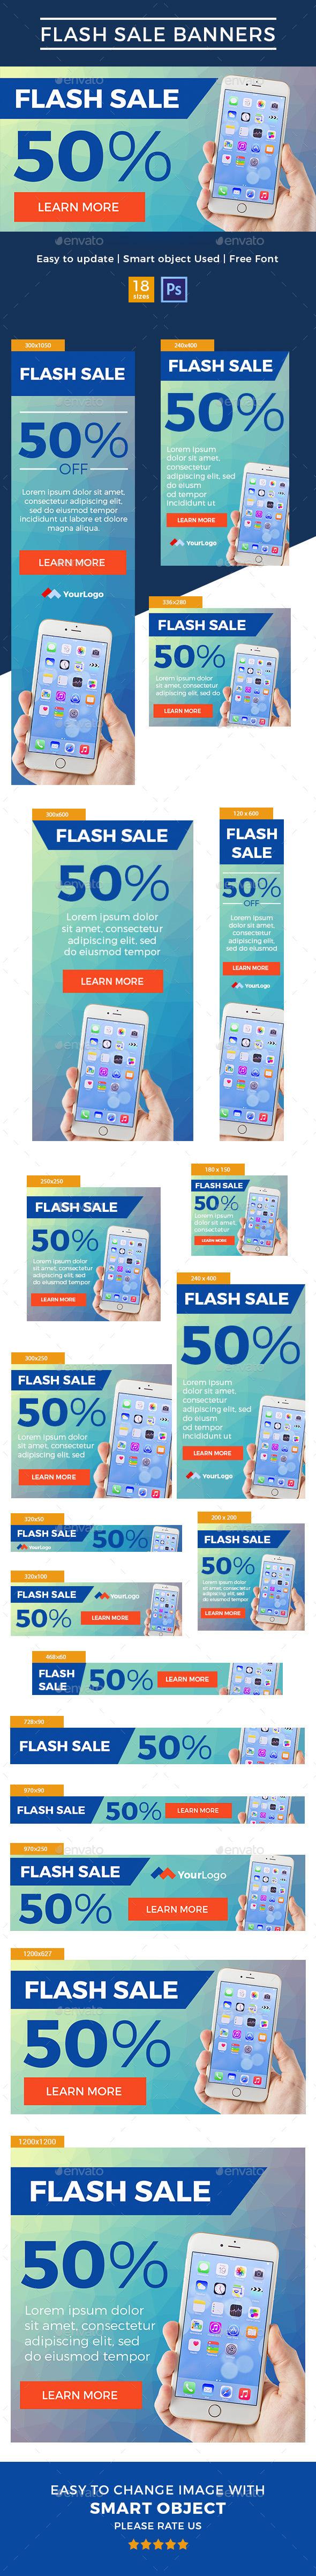 Flash Sale Web Banner - Banners & Ads Web Elements